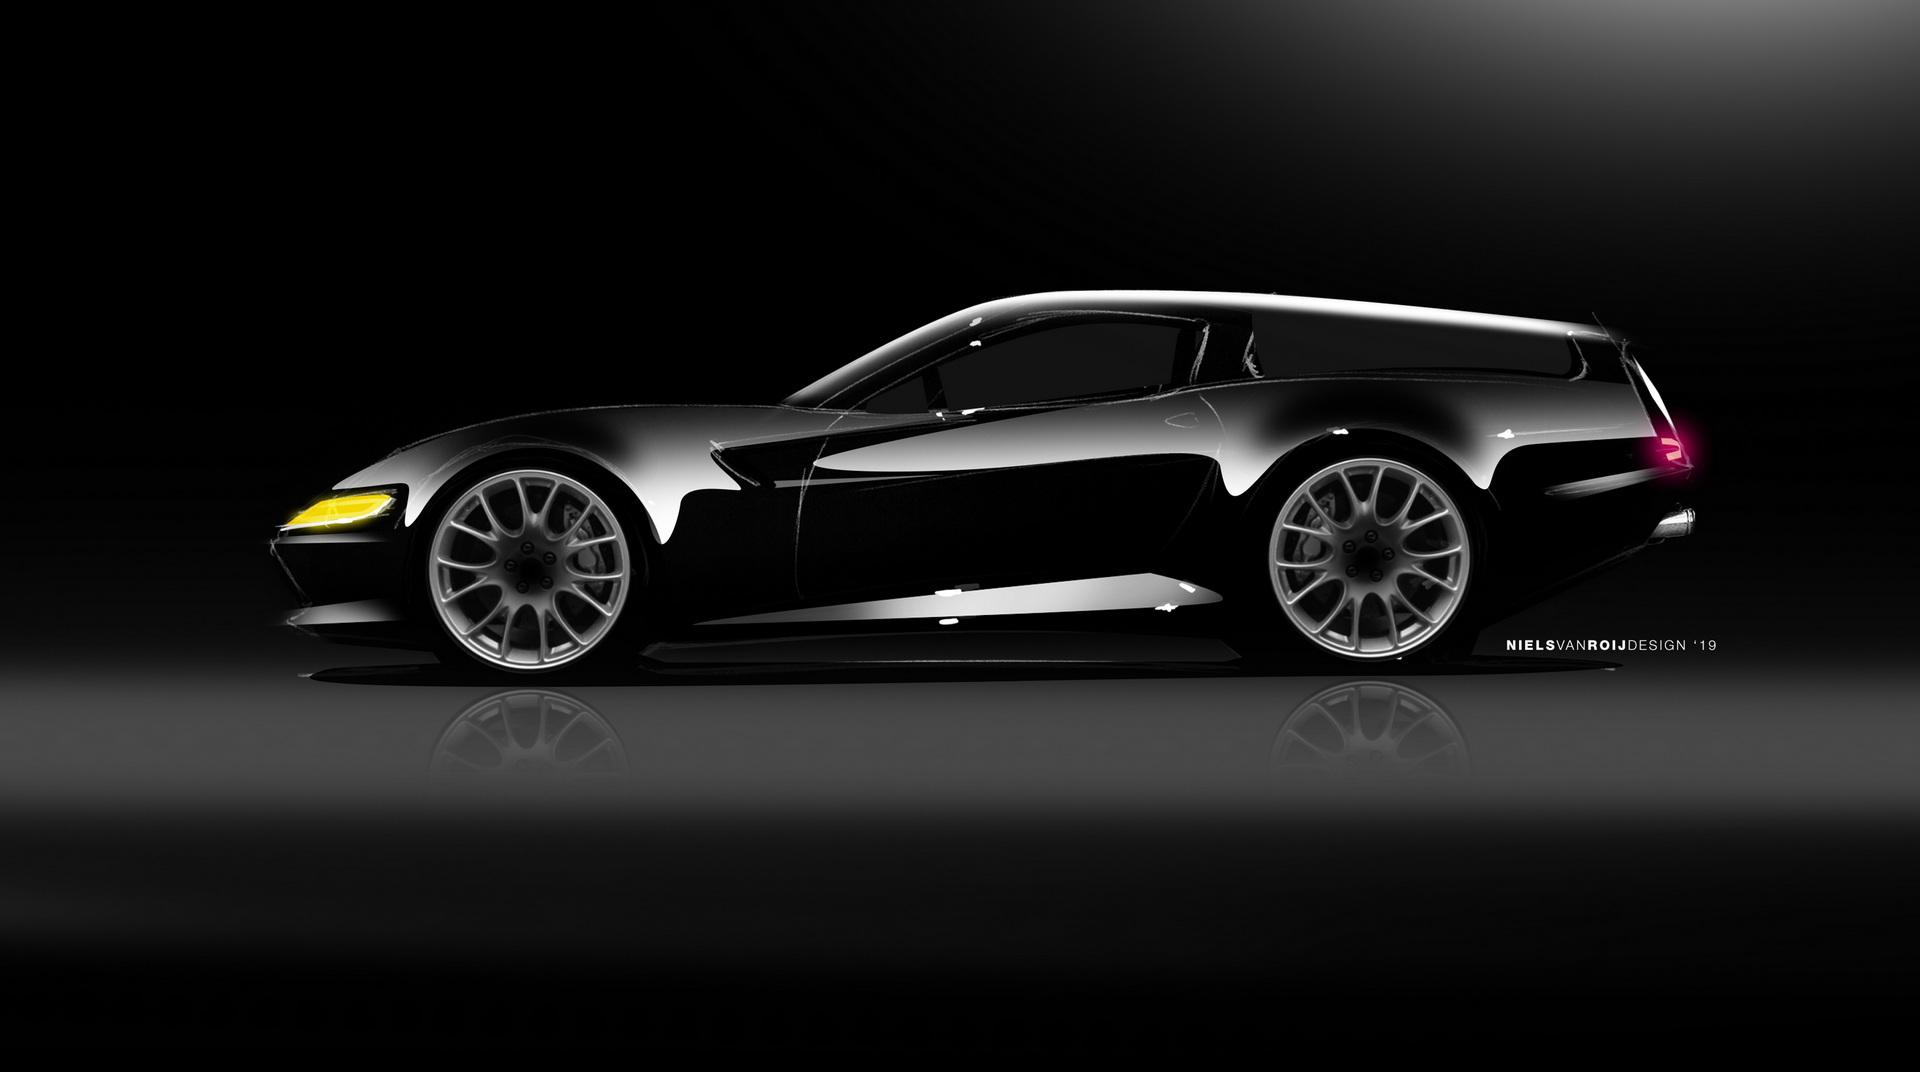 Ferrari-Daytona-Shooting-Brake-Hommage-by-Niels-van-Roij-Design-5